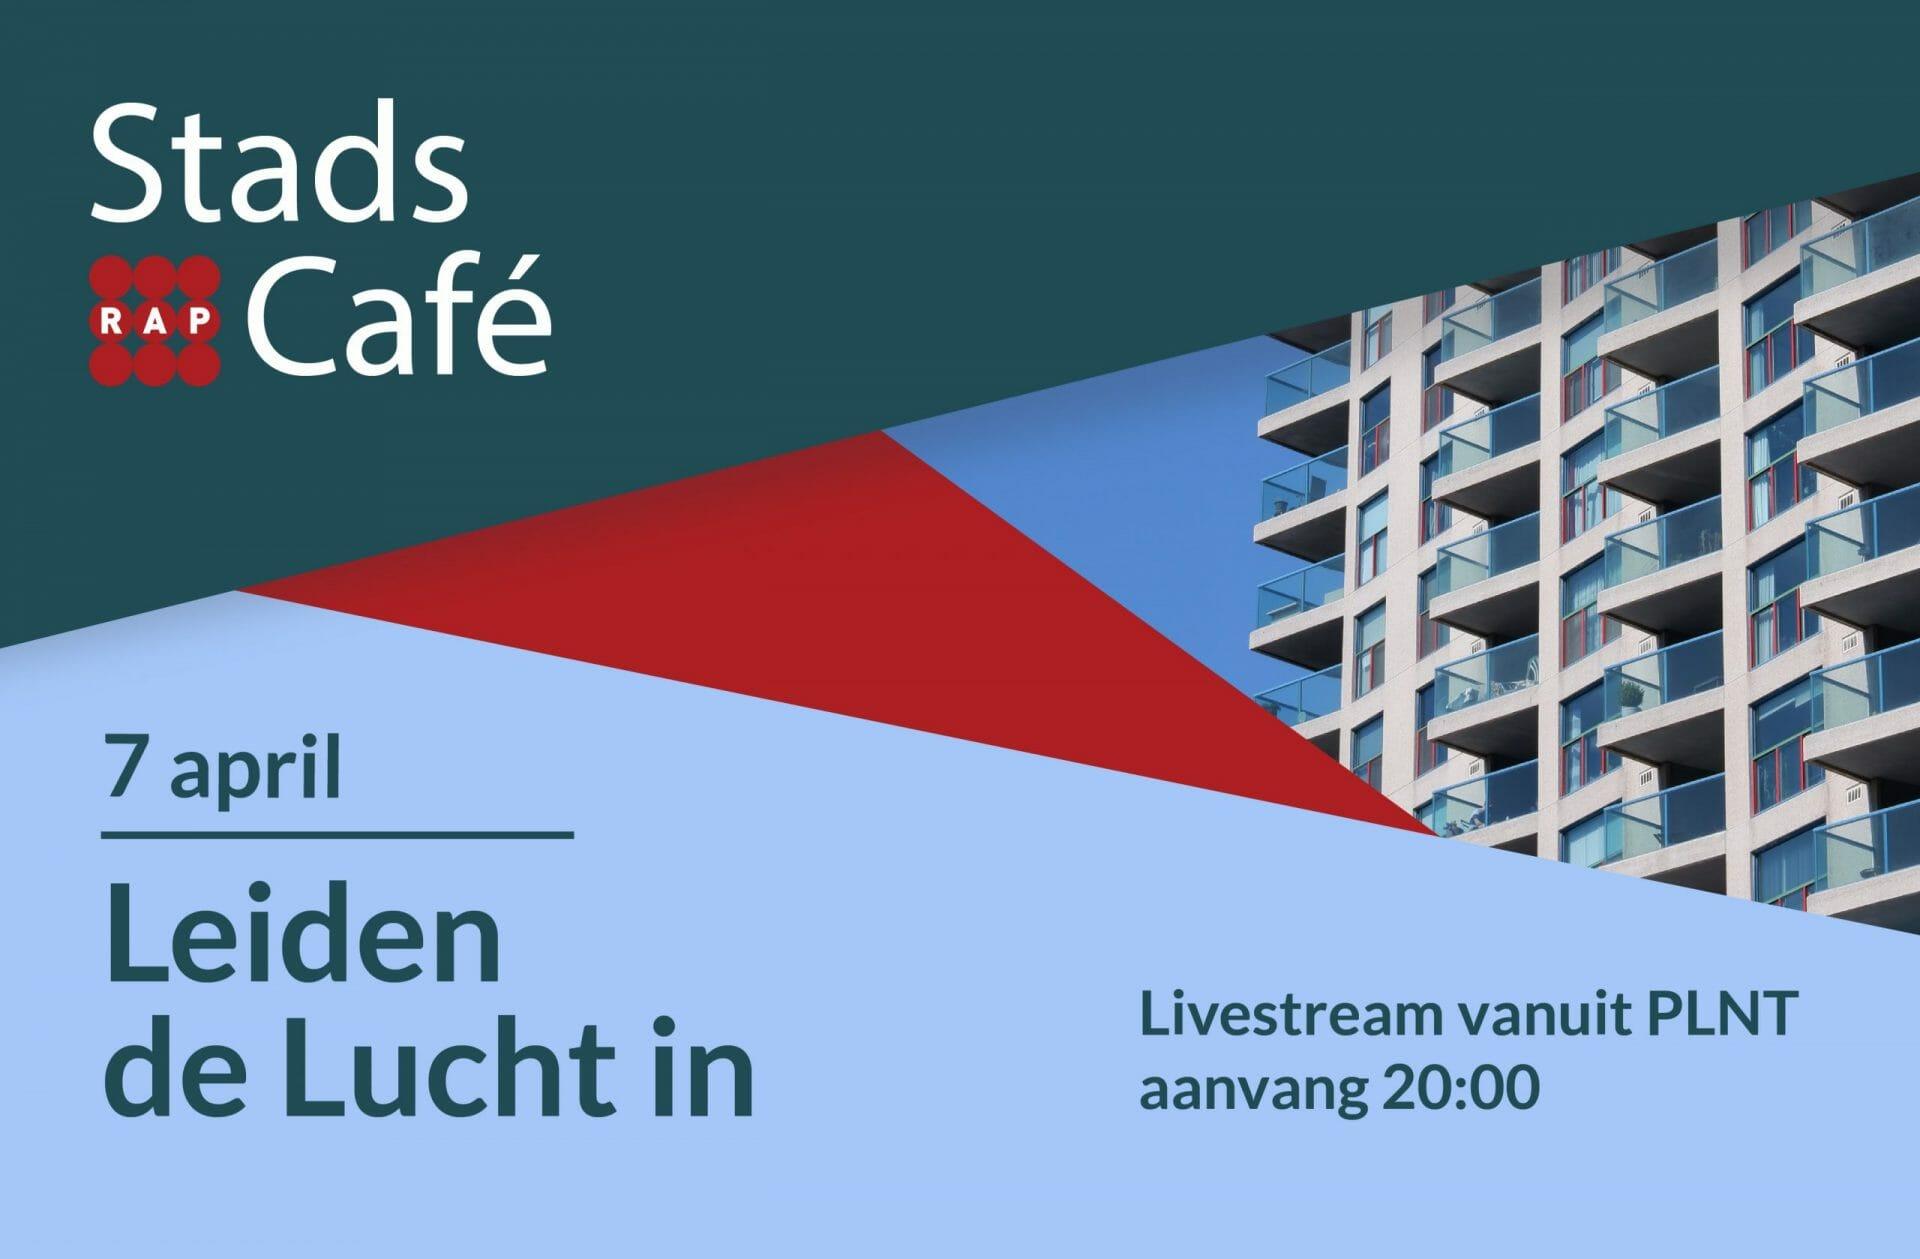 Stadscafé #18 Leiden de Lucht in: Wonen op grote Hoogte